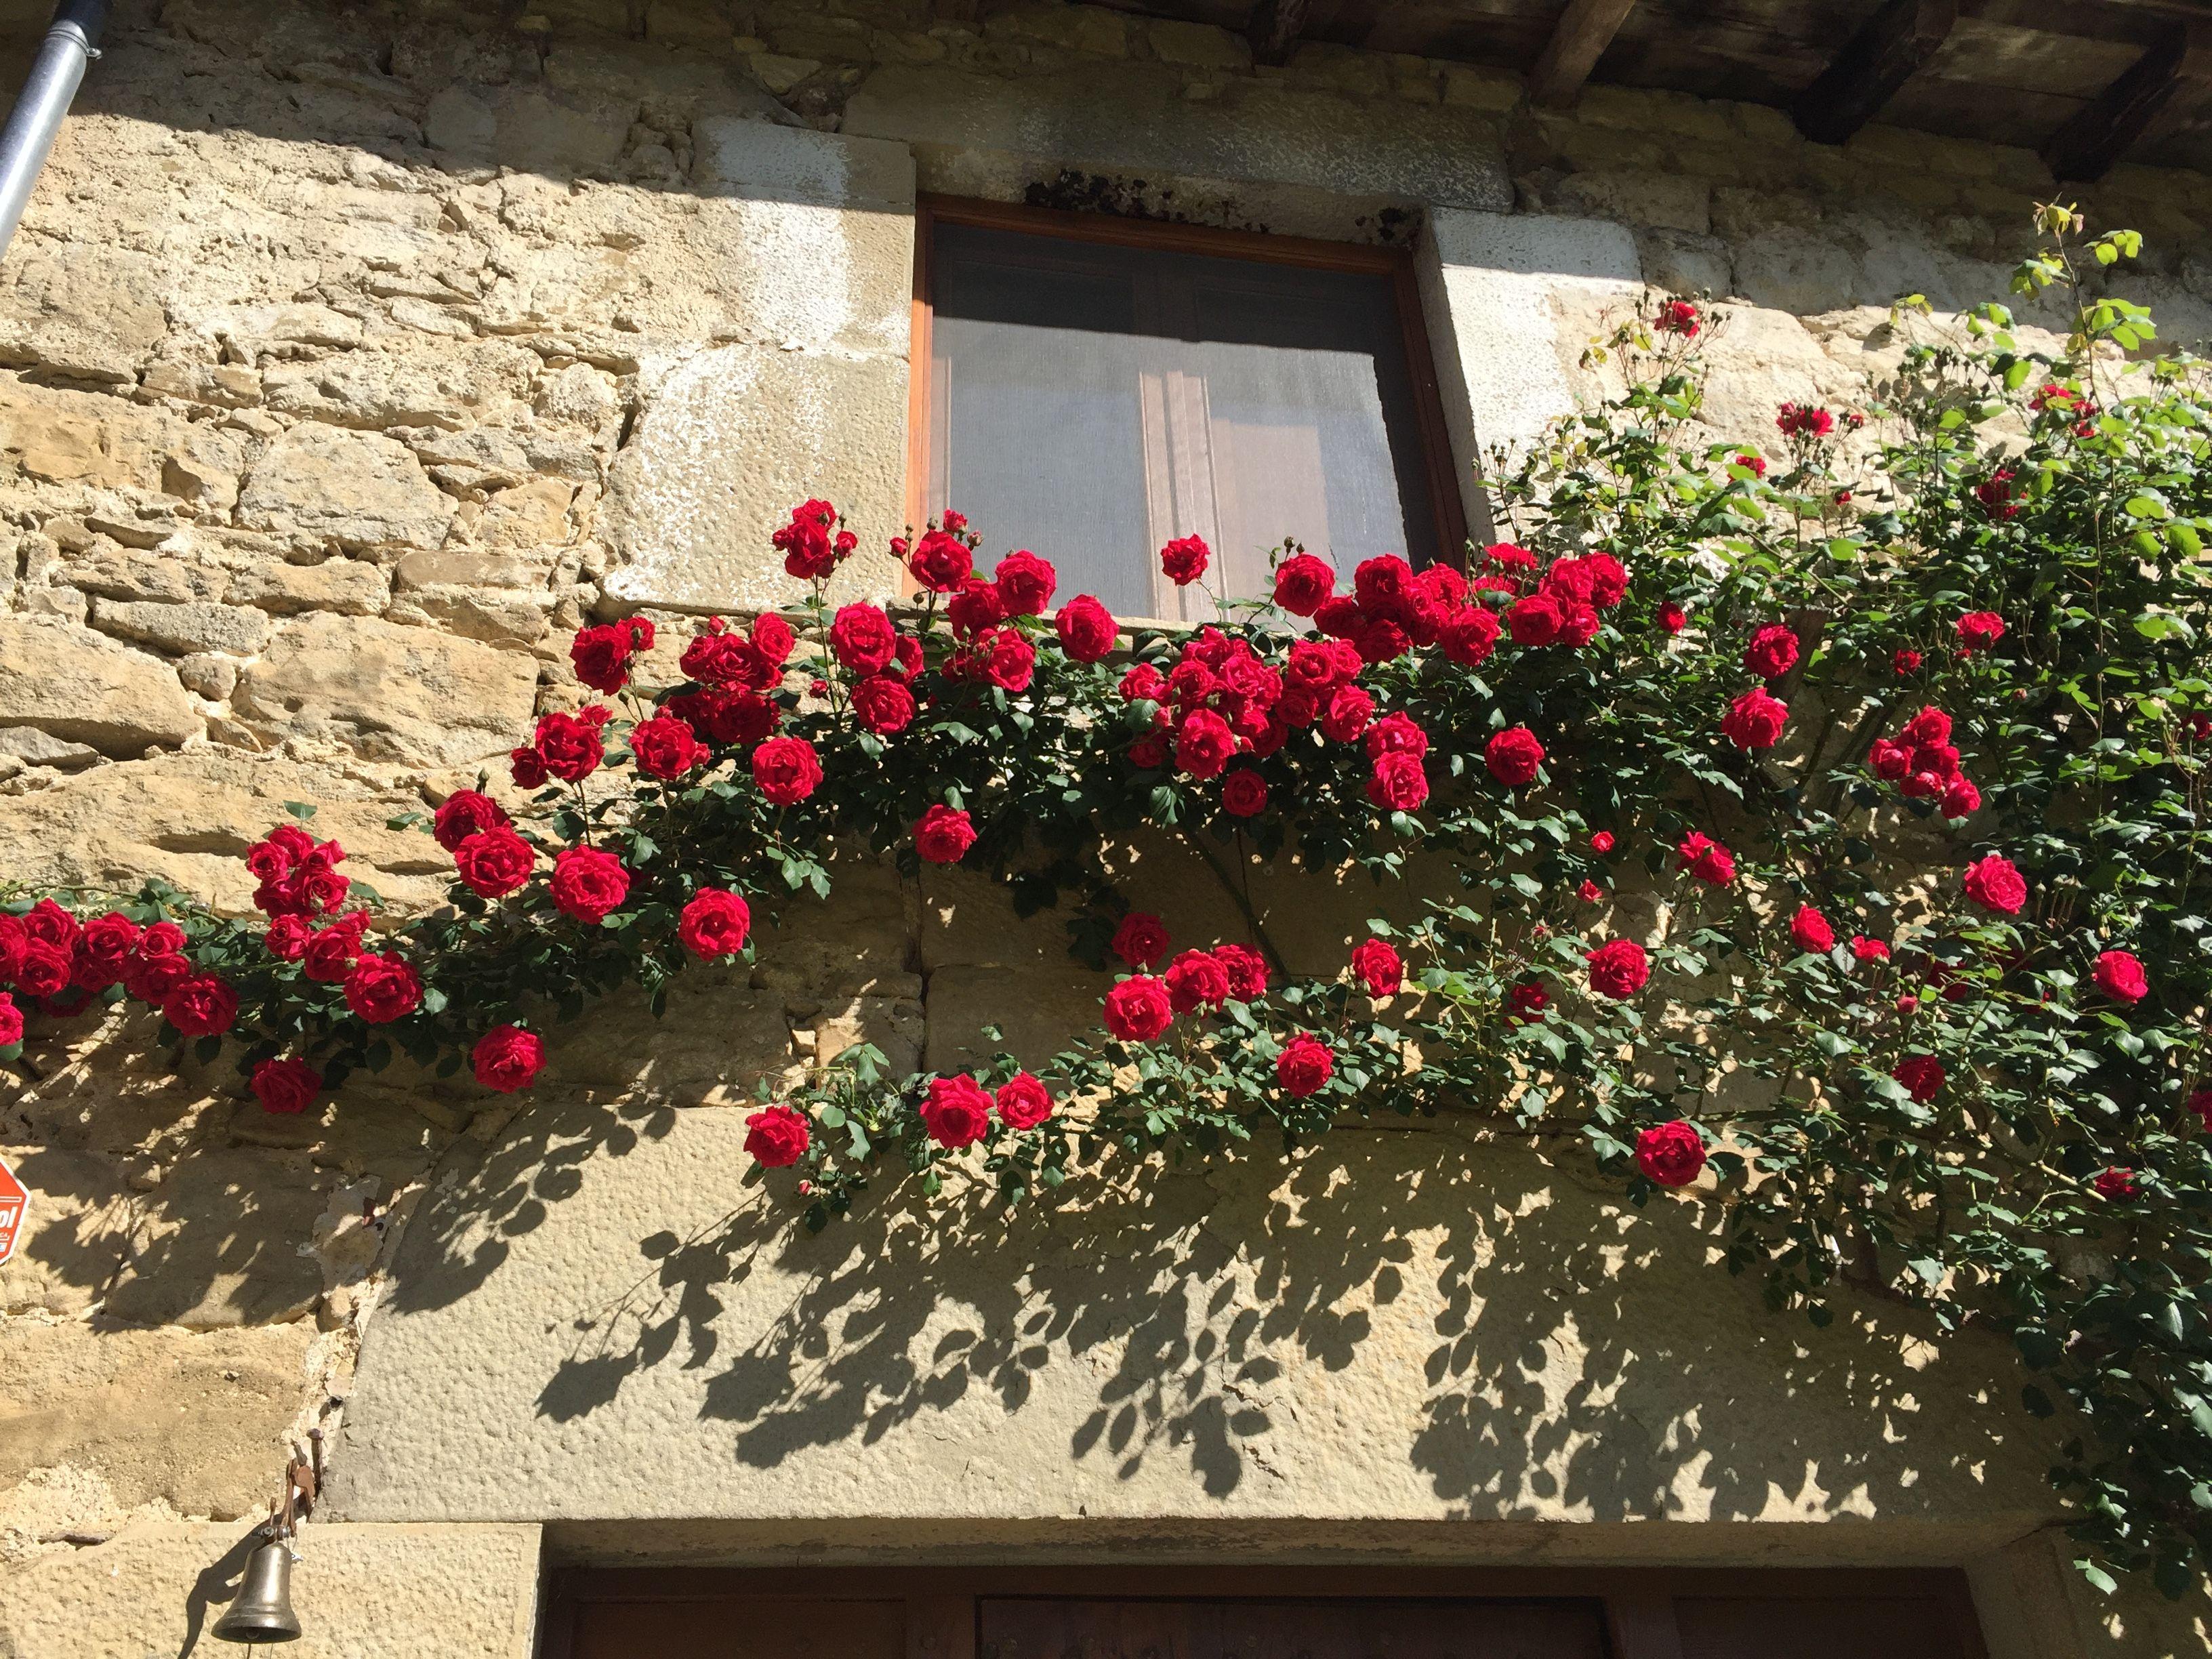 Rosal Trepador Christmas Wreaths Holiday Decor Holiday